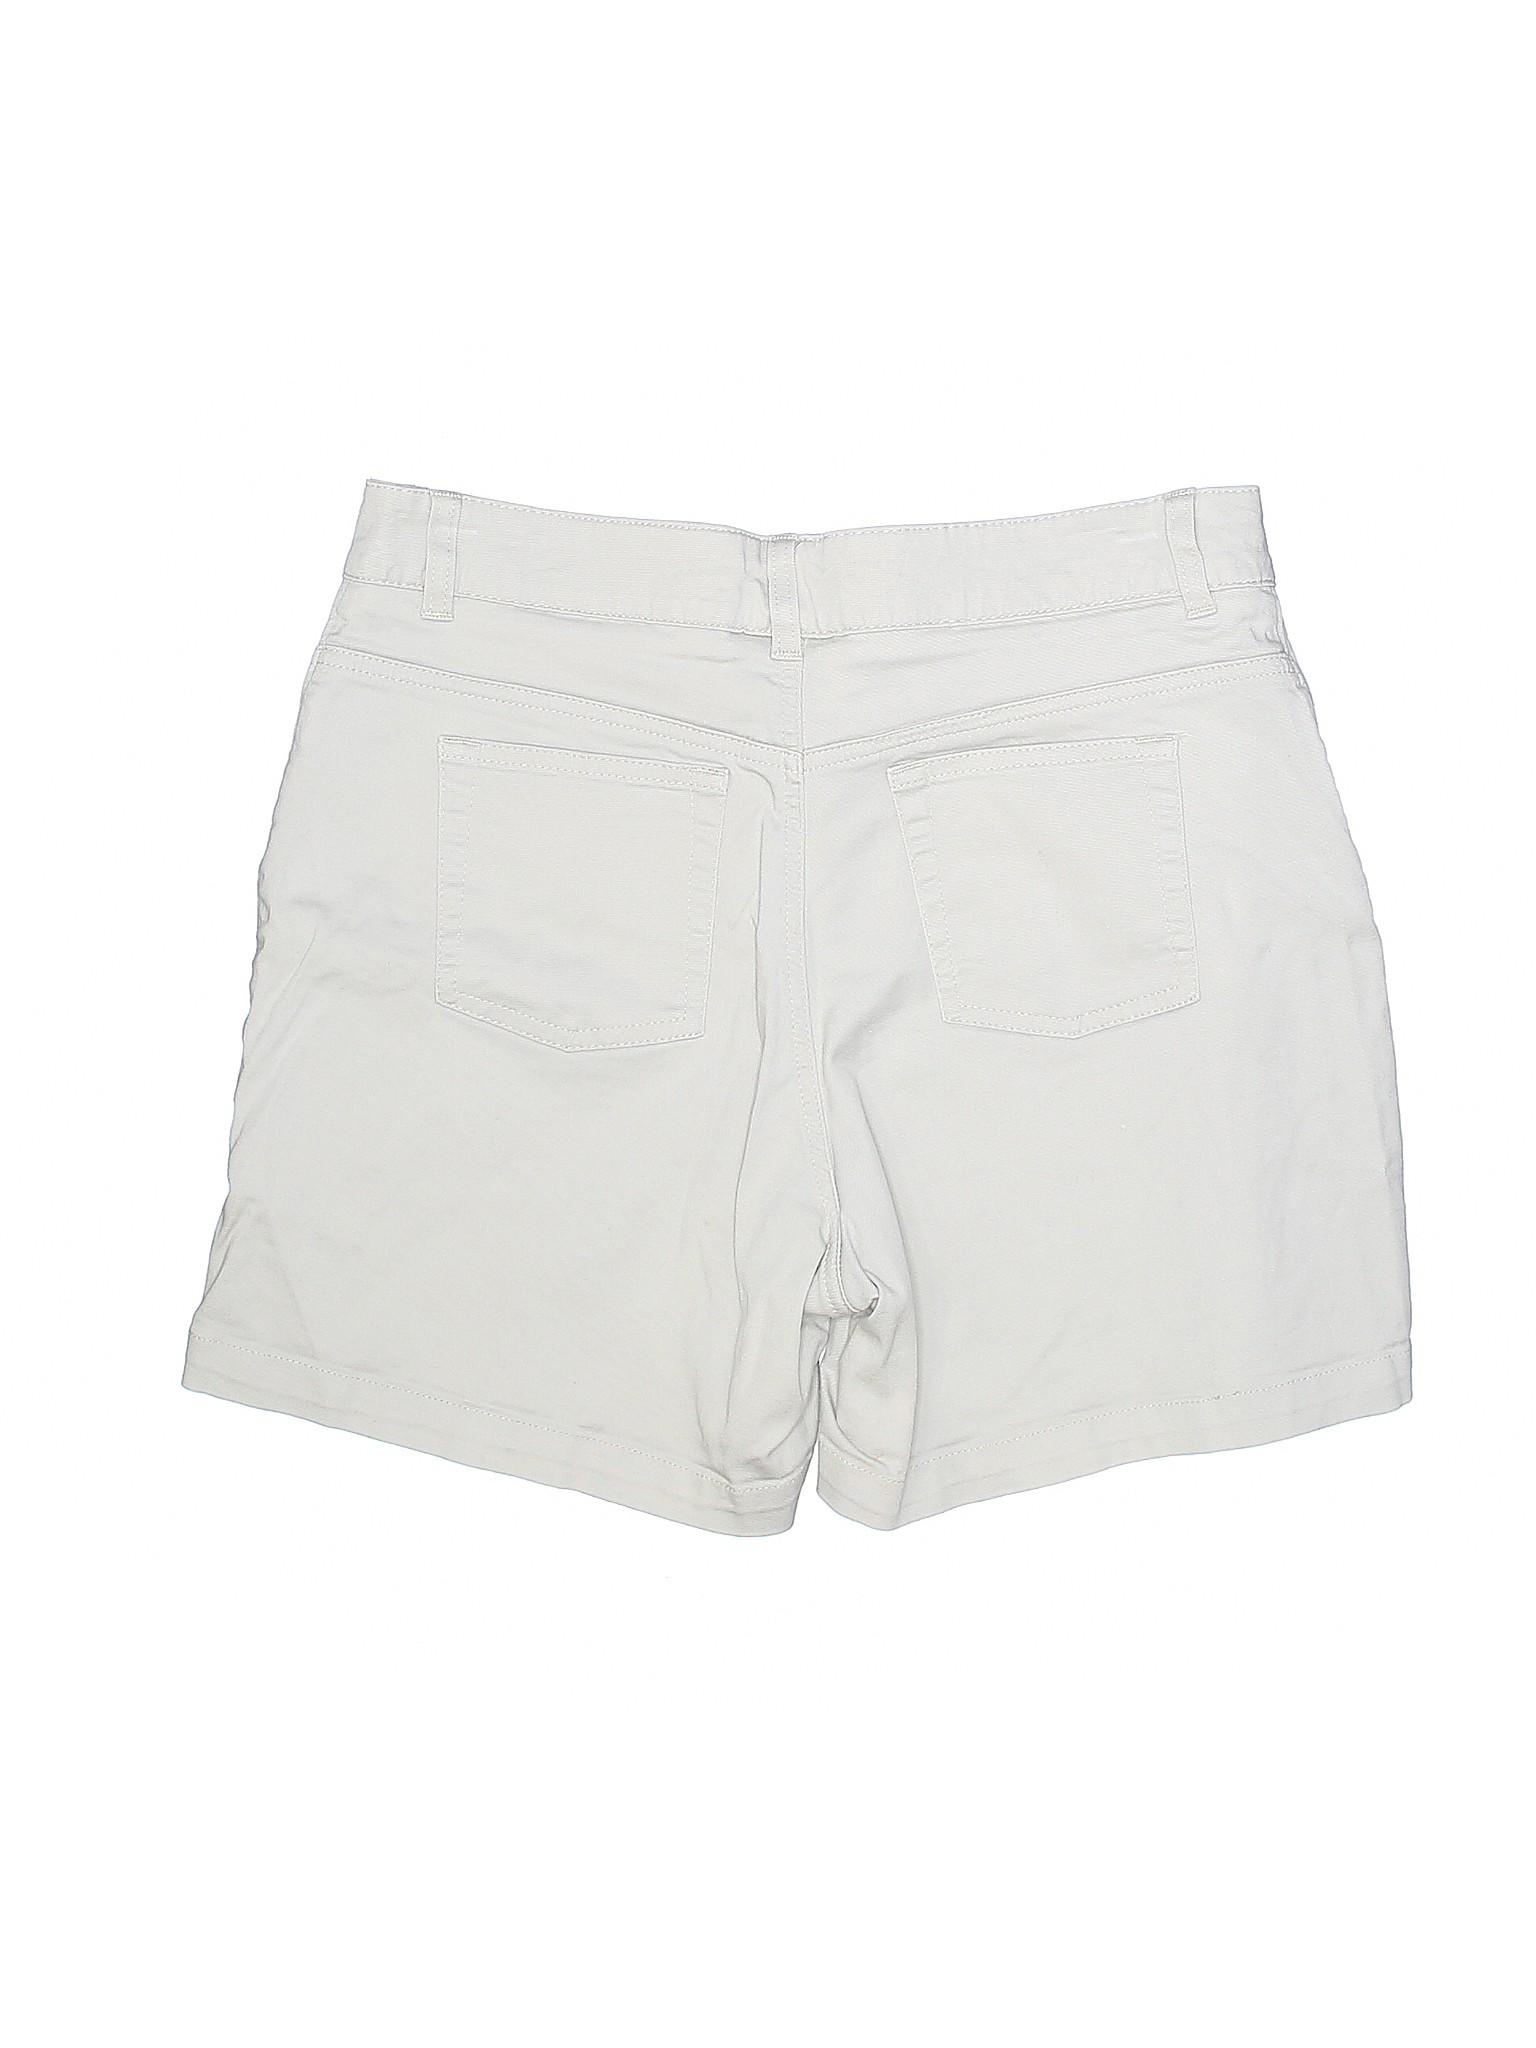 Boutique Shorts Lee Lee Boutique Shorts Lee Boutique Shorts Lee Boutique qAaw0v0